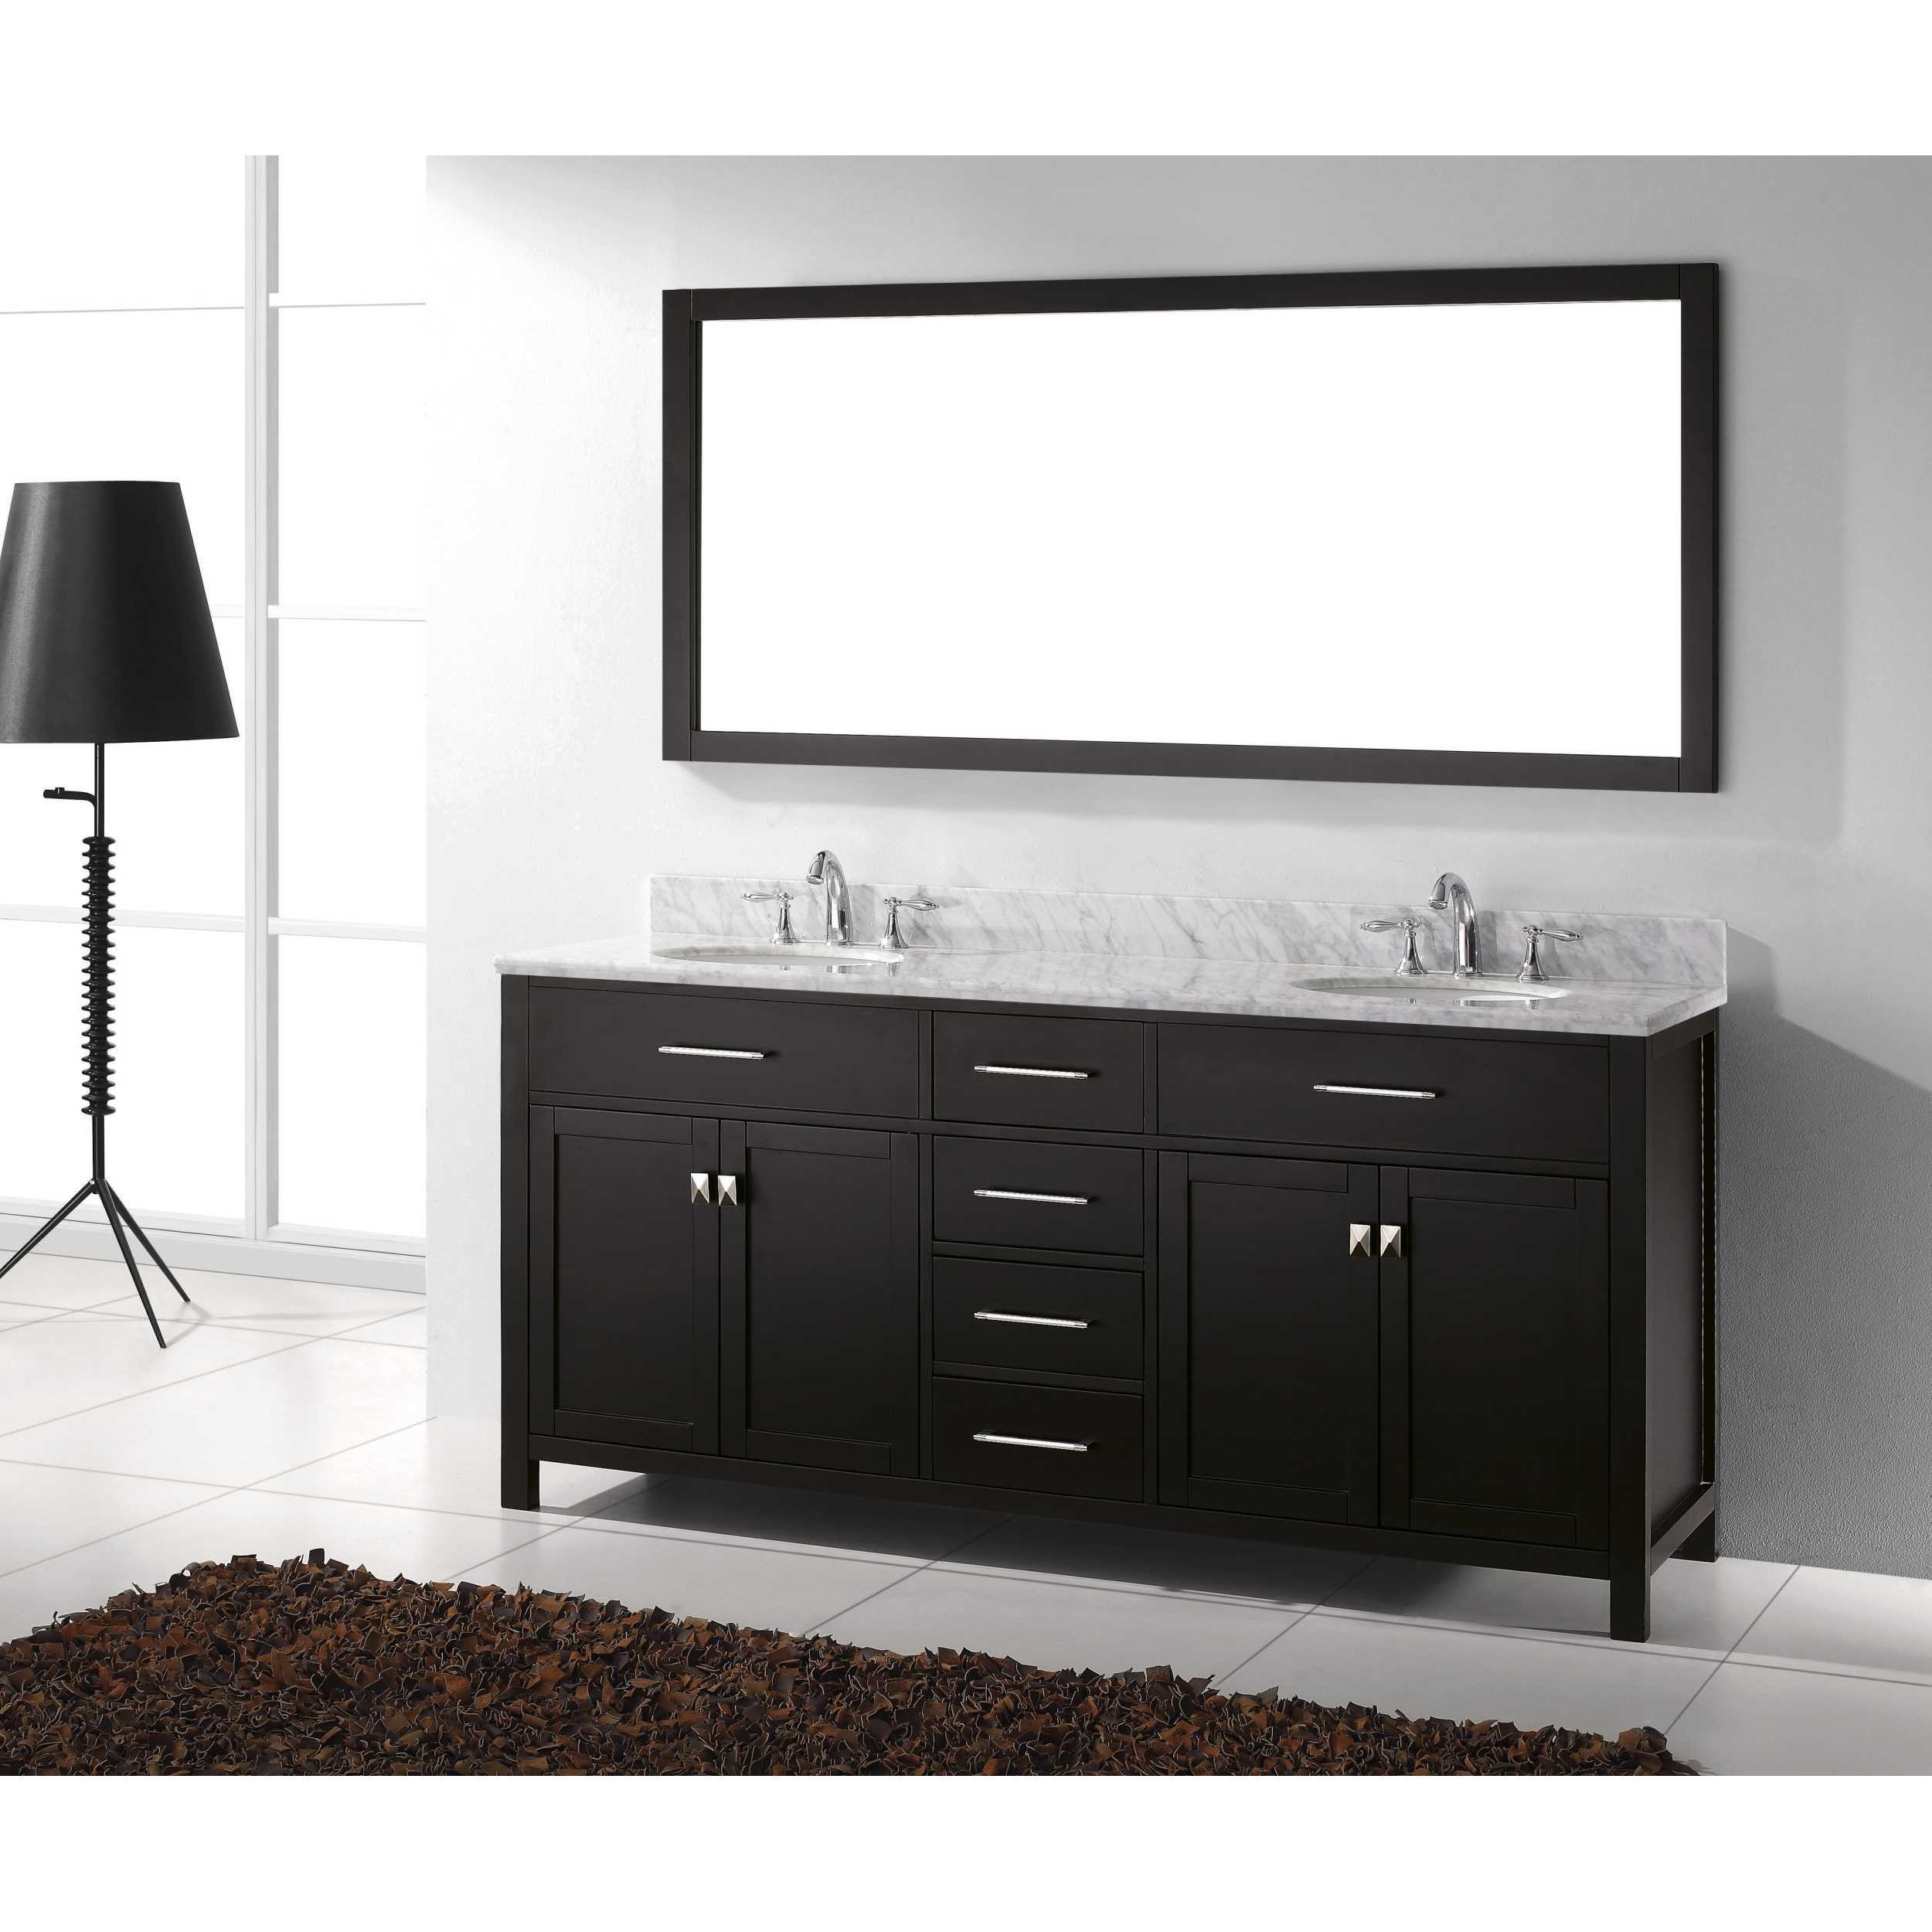 Double sink white bathroom vanities virtu usa caroline inch round double bathroom vanity set with